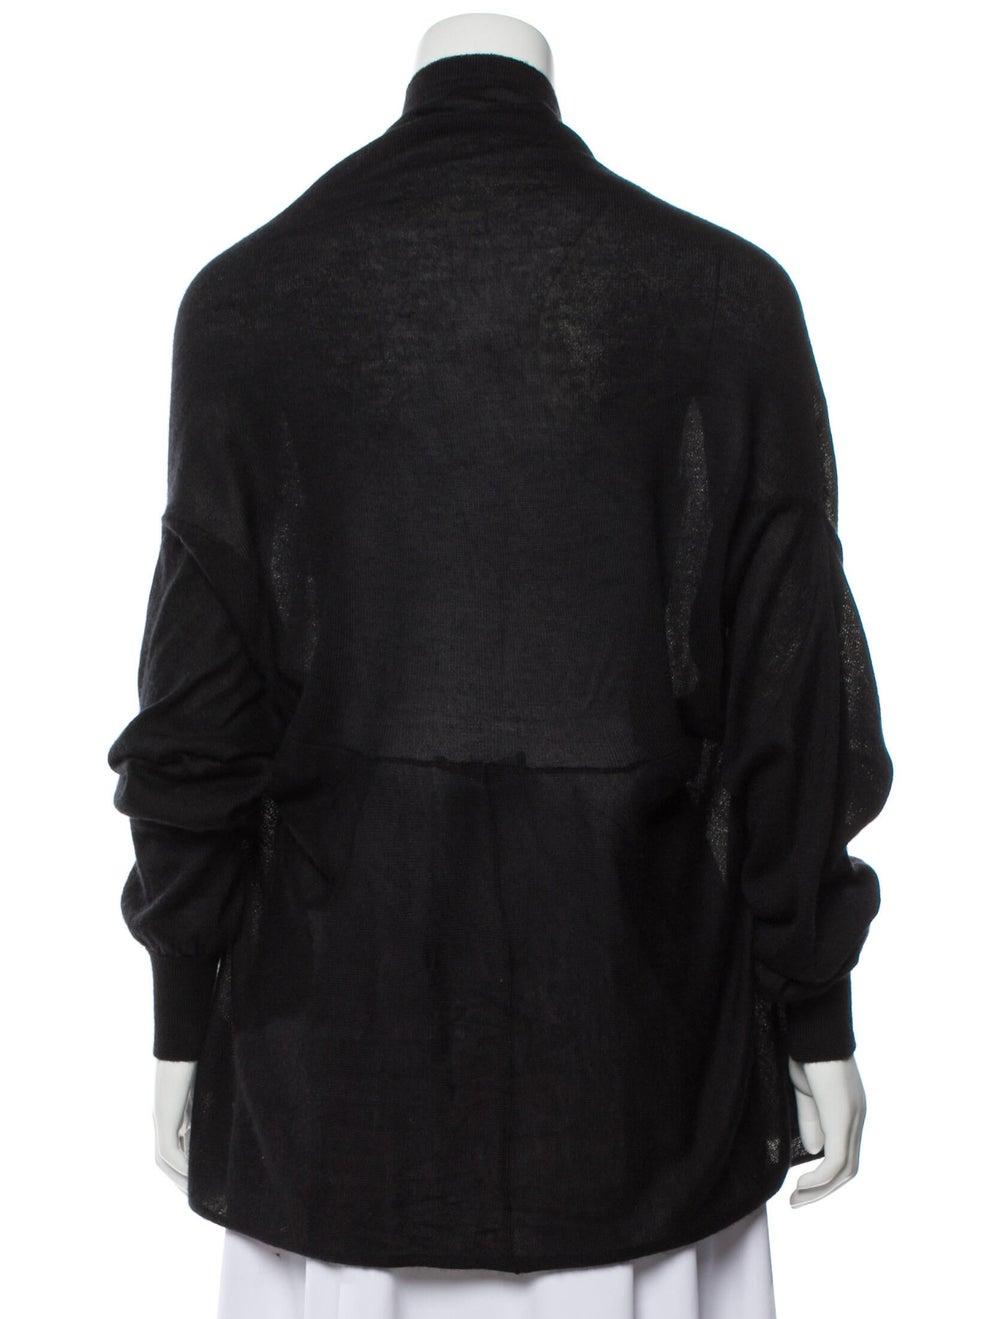 Dolce & Gabbana Cashmere and Silk-Blend Knit Black - image 3